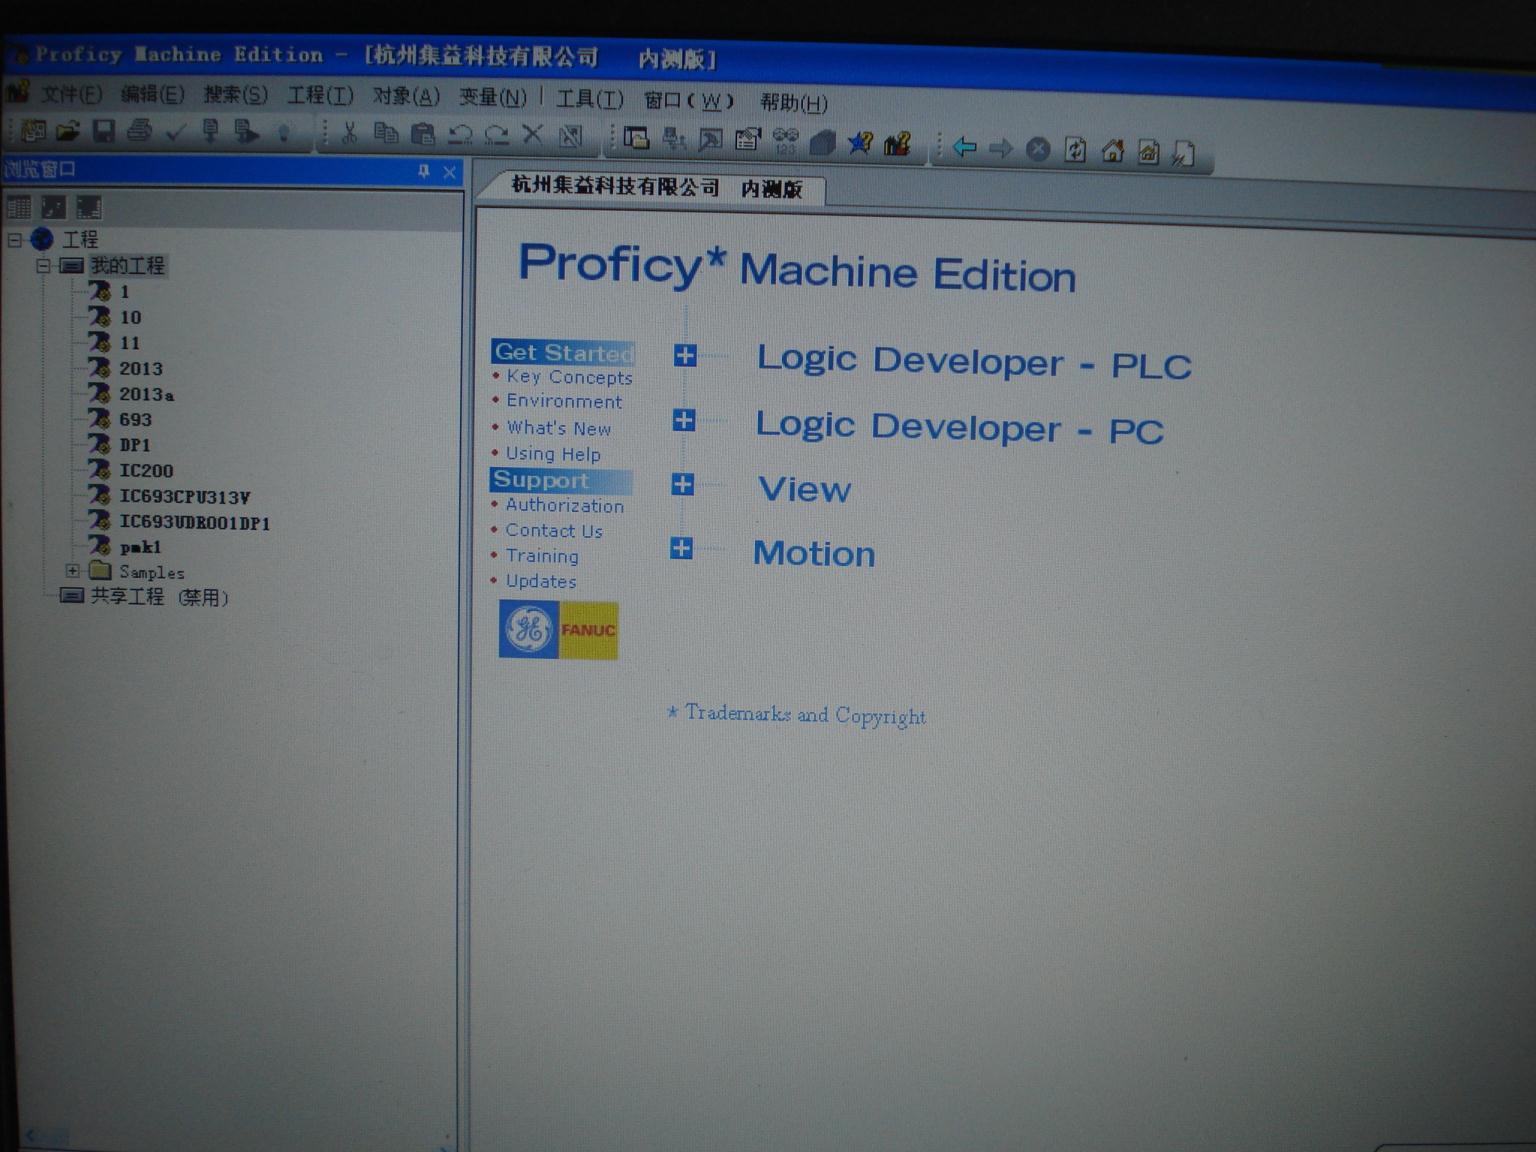 Ge Program Design Software Profile Machine Edition 5 90 Chinese License